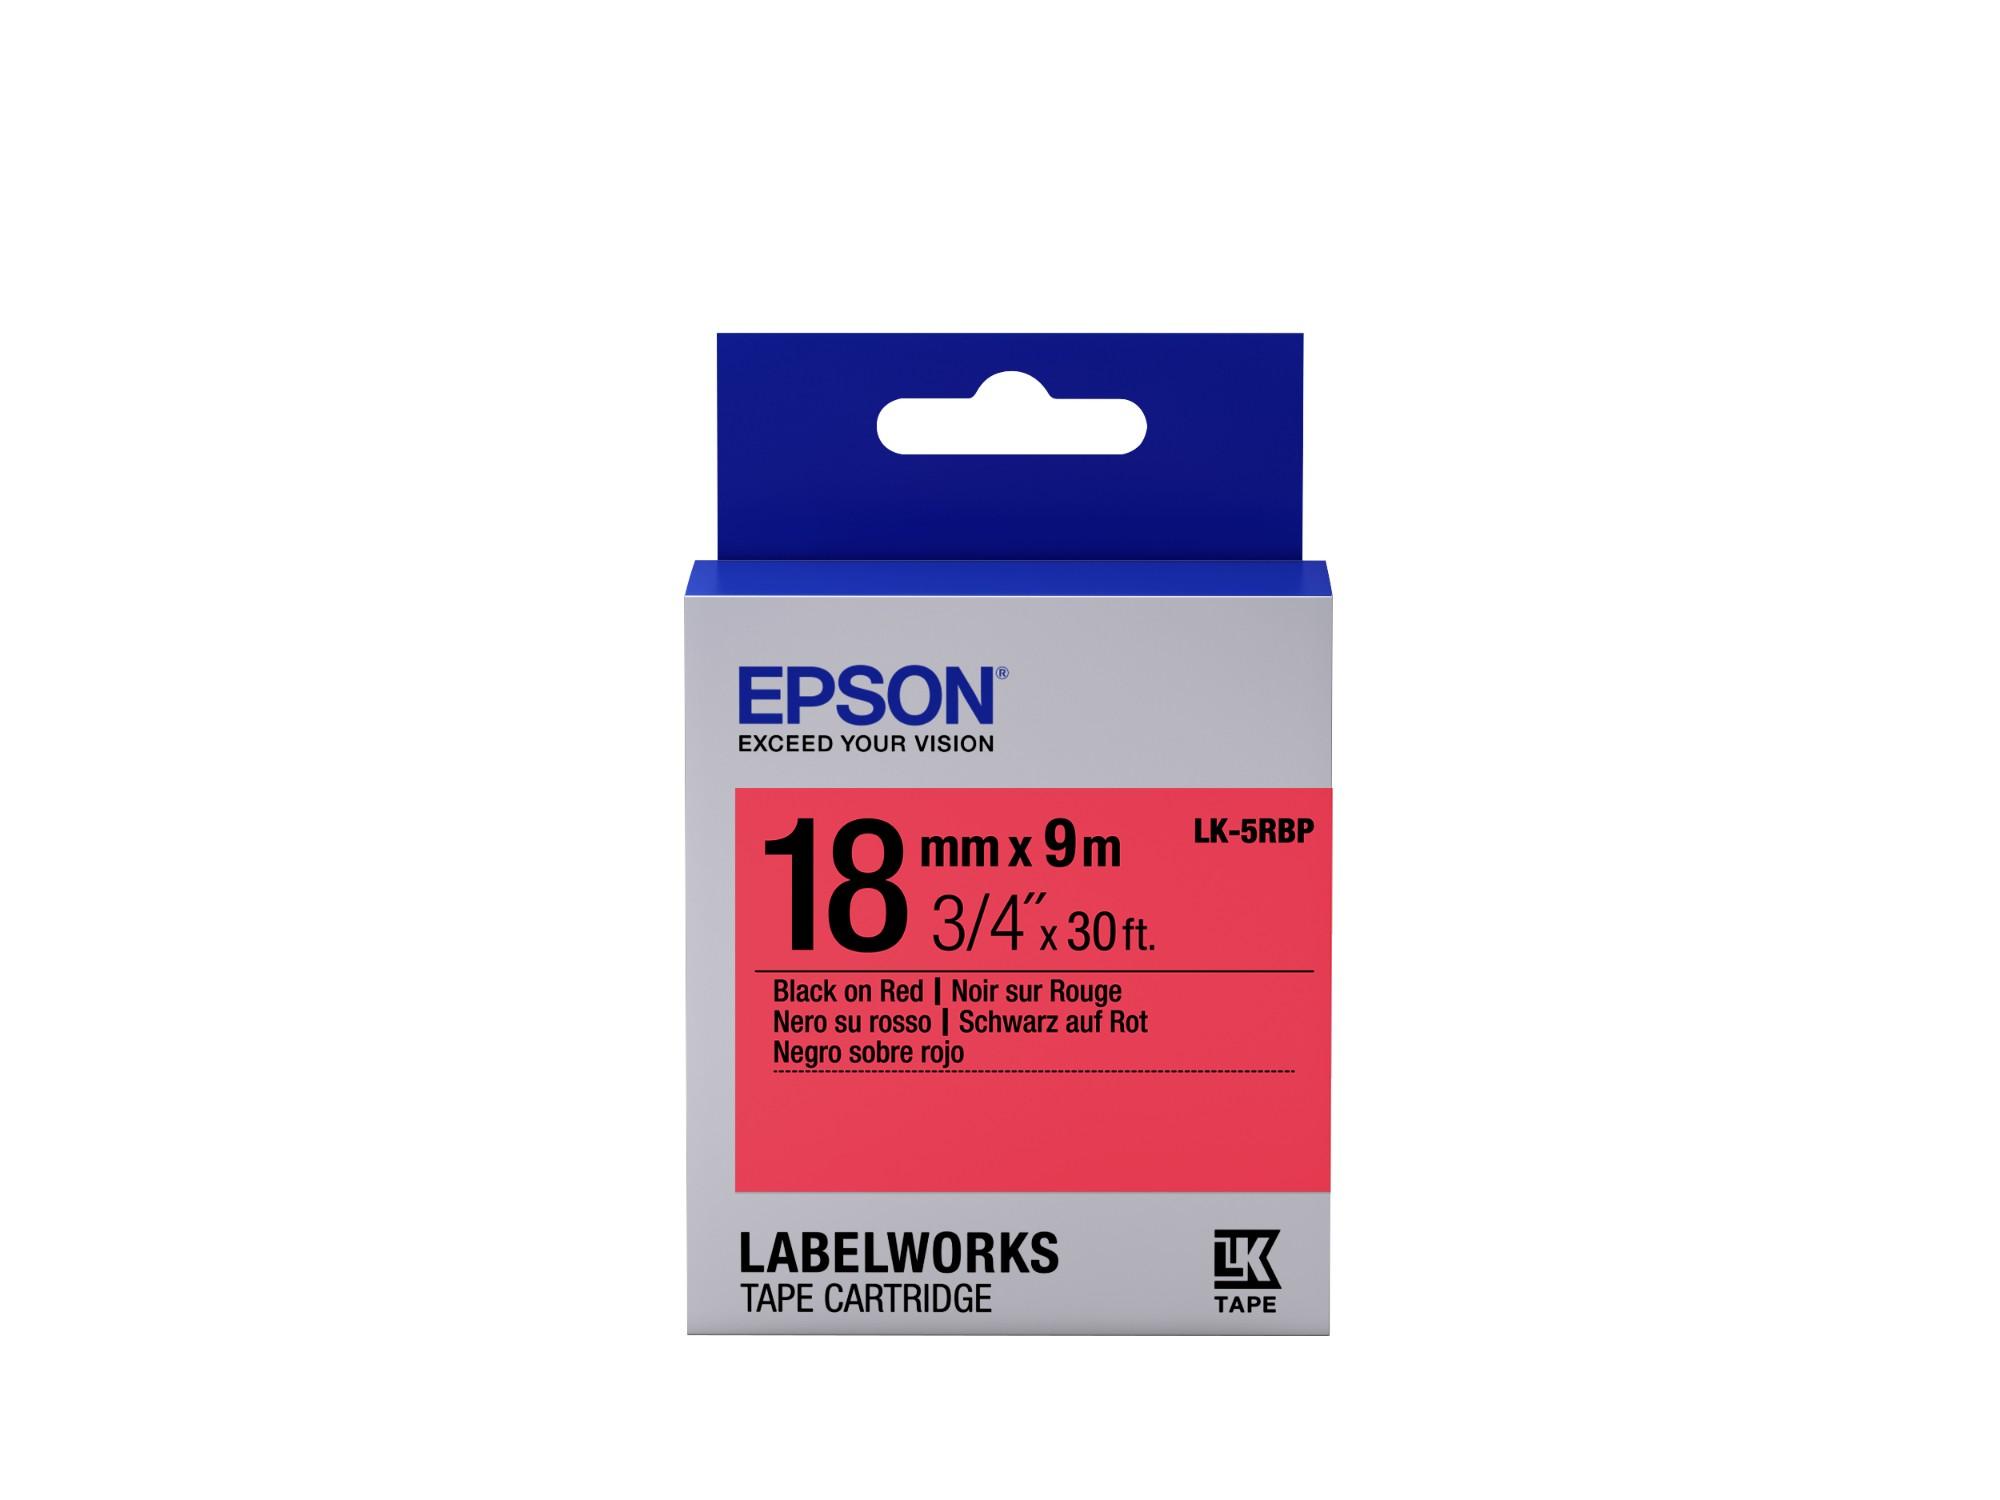 Epson Pastel Tape - LK-5RBP Pastel Blk/Red 18/9